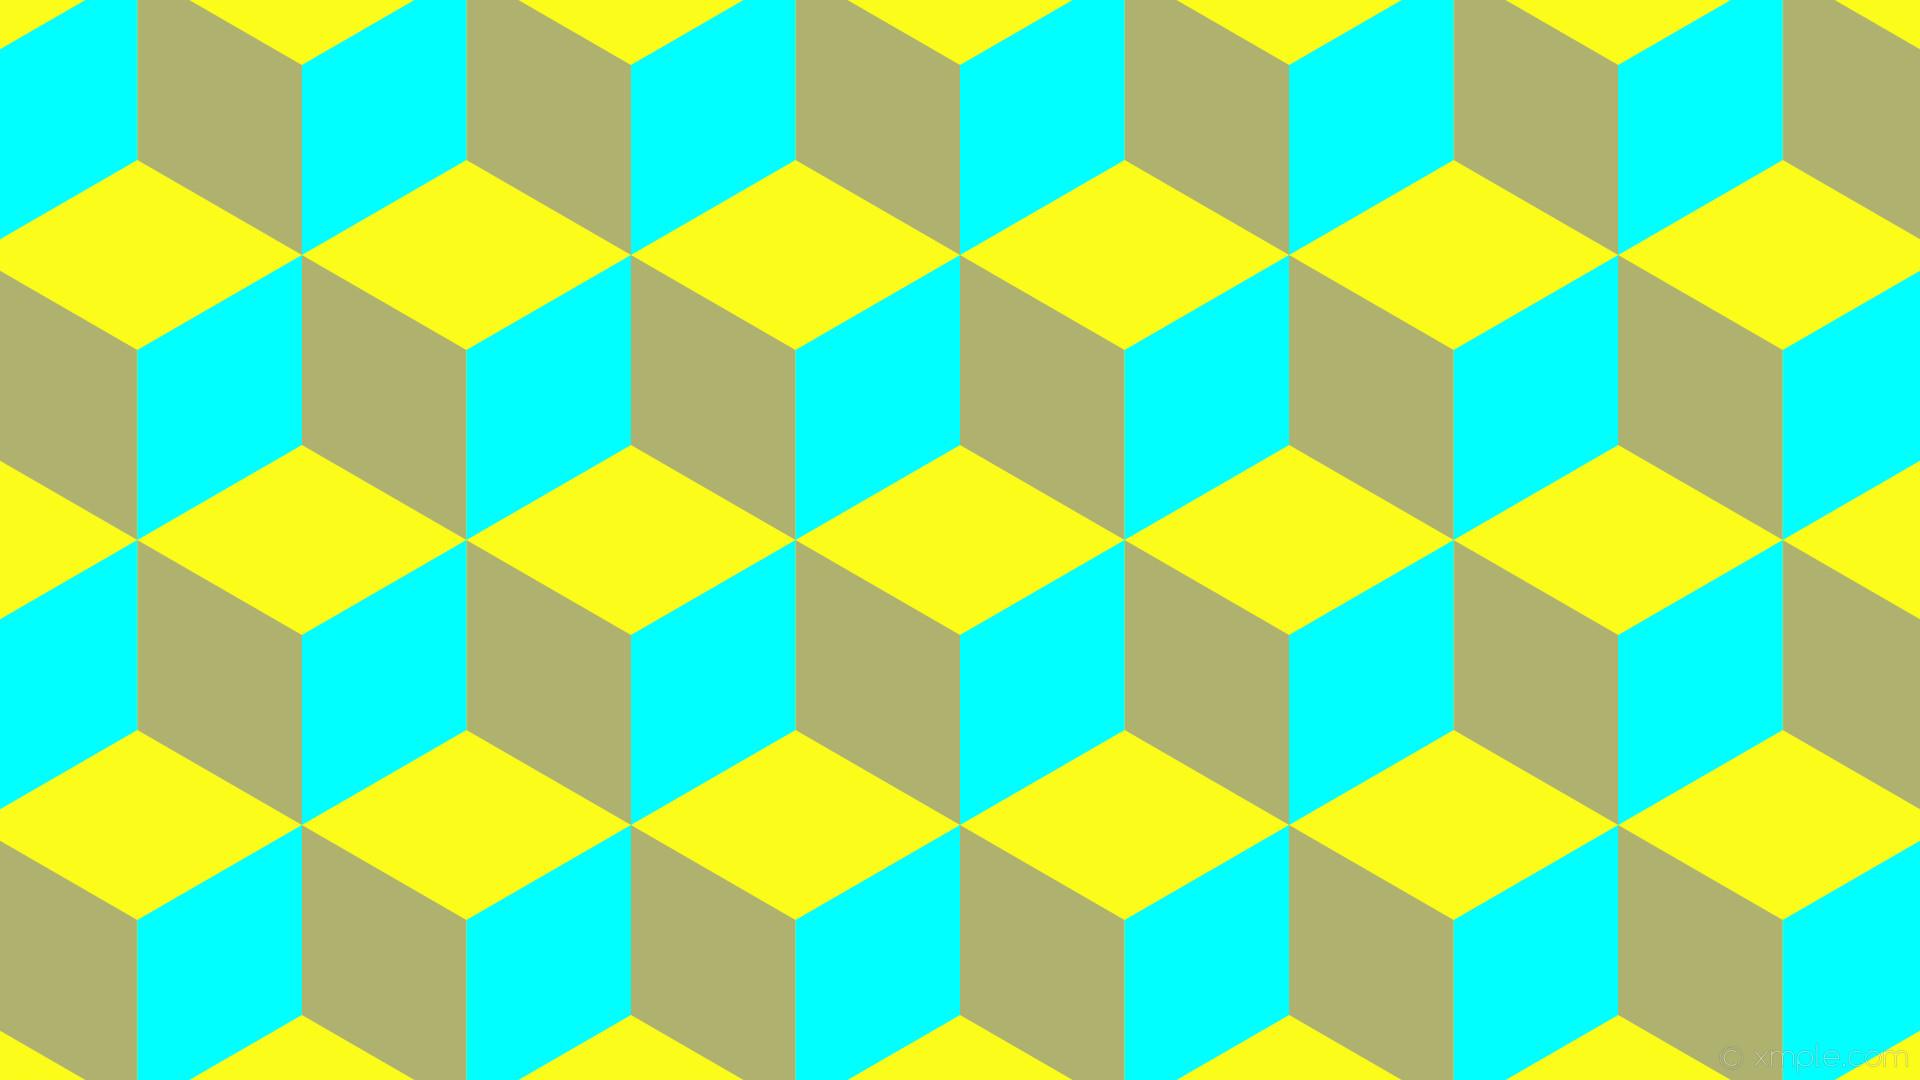 wallpaper 3d cubes blue yellow aqua cyan #fcfc1b #afb26f #00ffff 0° 190px